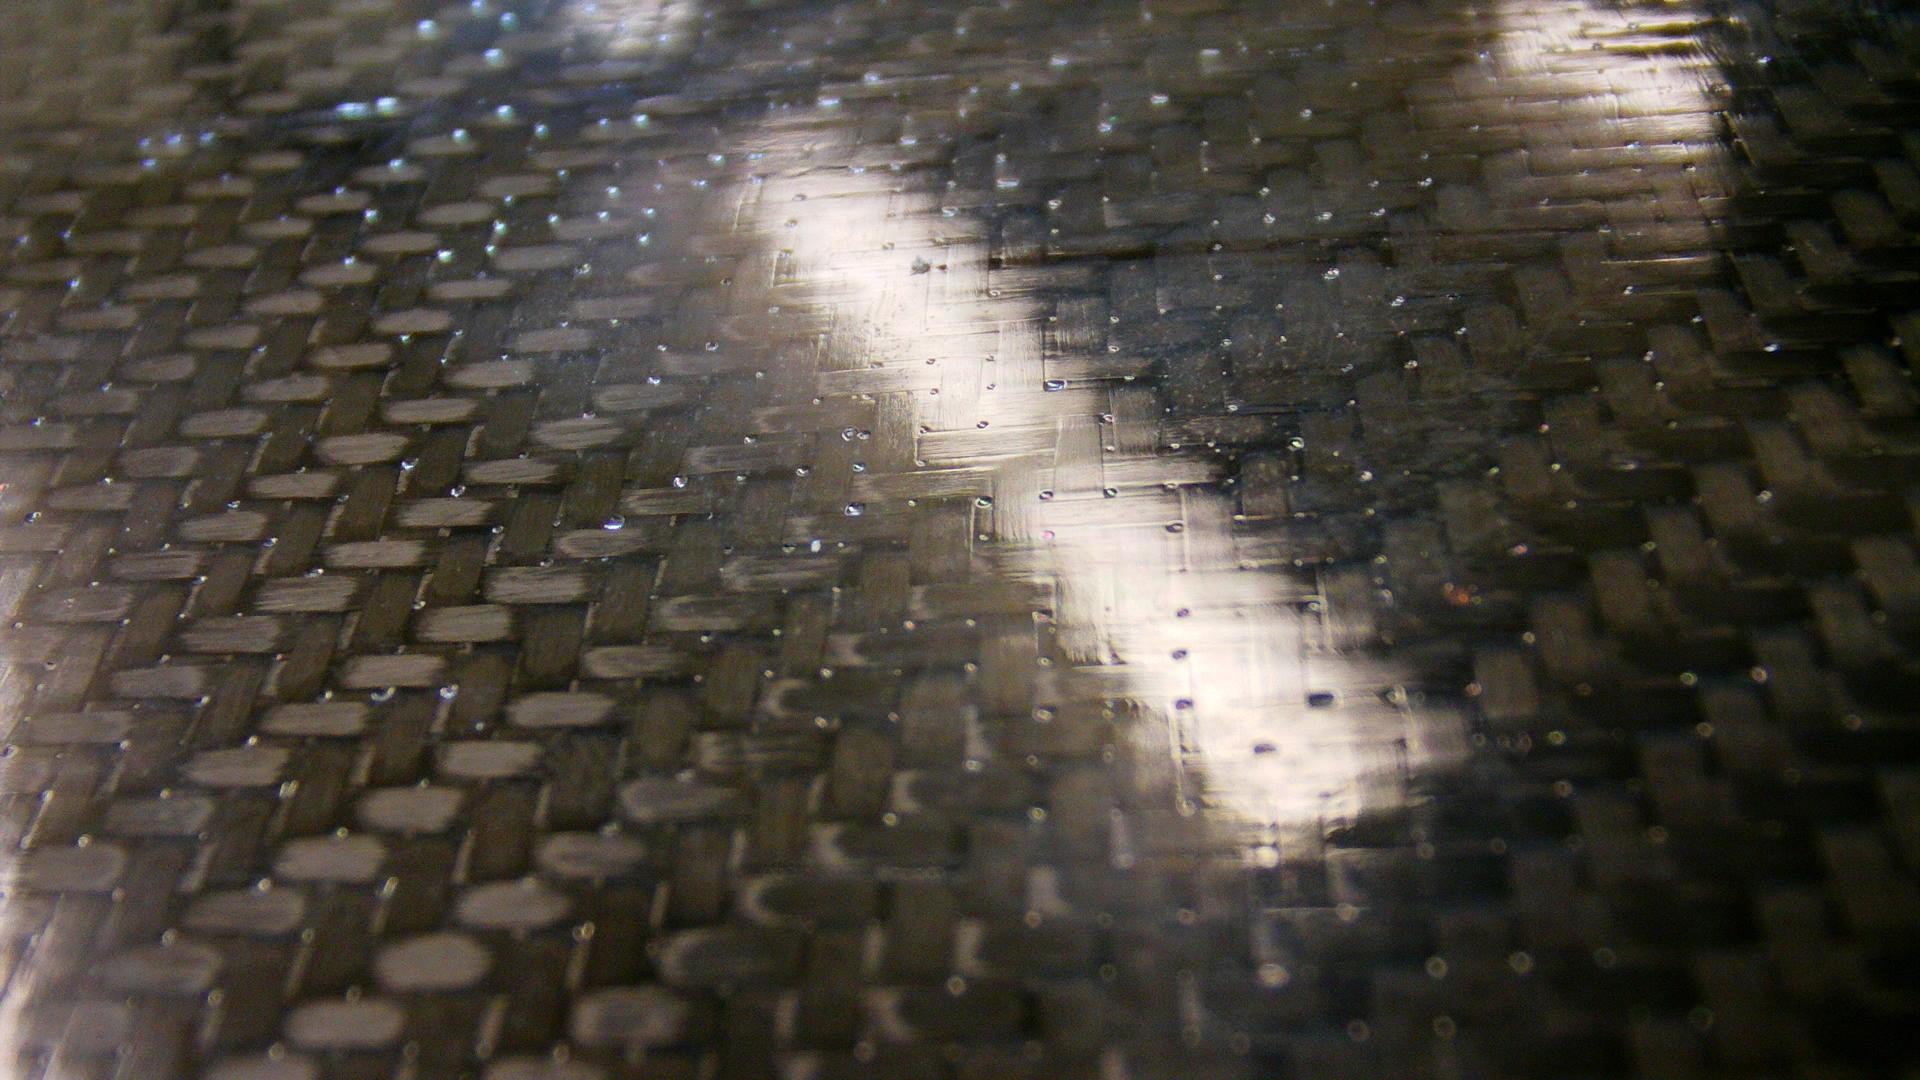 Do You Have A Carbon Fiber Laminate With Pinholes